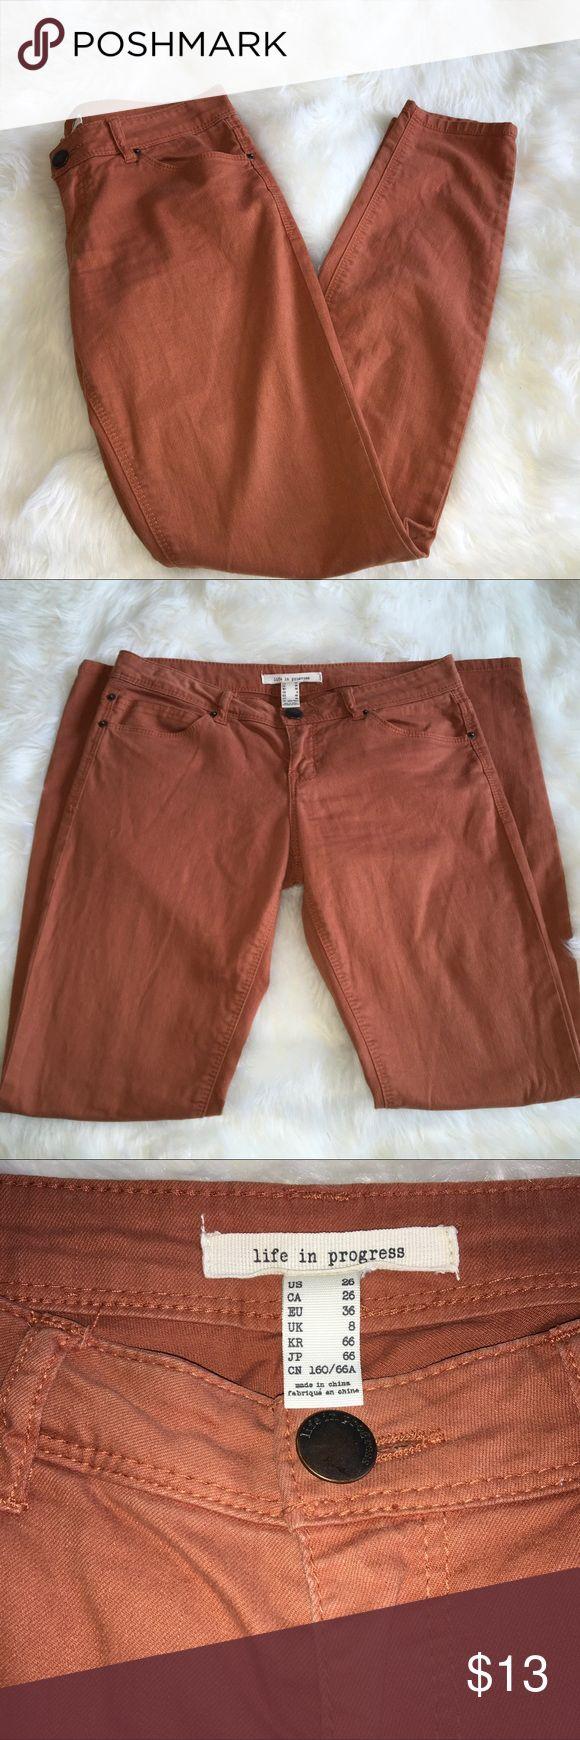 Life in progress burnt orange skinny jeans size26 Size 26, burnt orange skinny jeans by life in progress. Has stain on one leg. See pics provided. life in progress Jeans Skinny